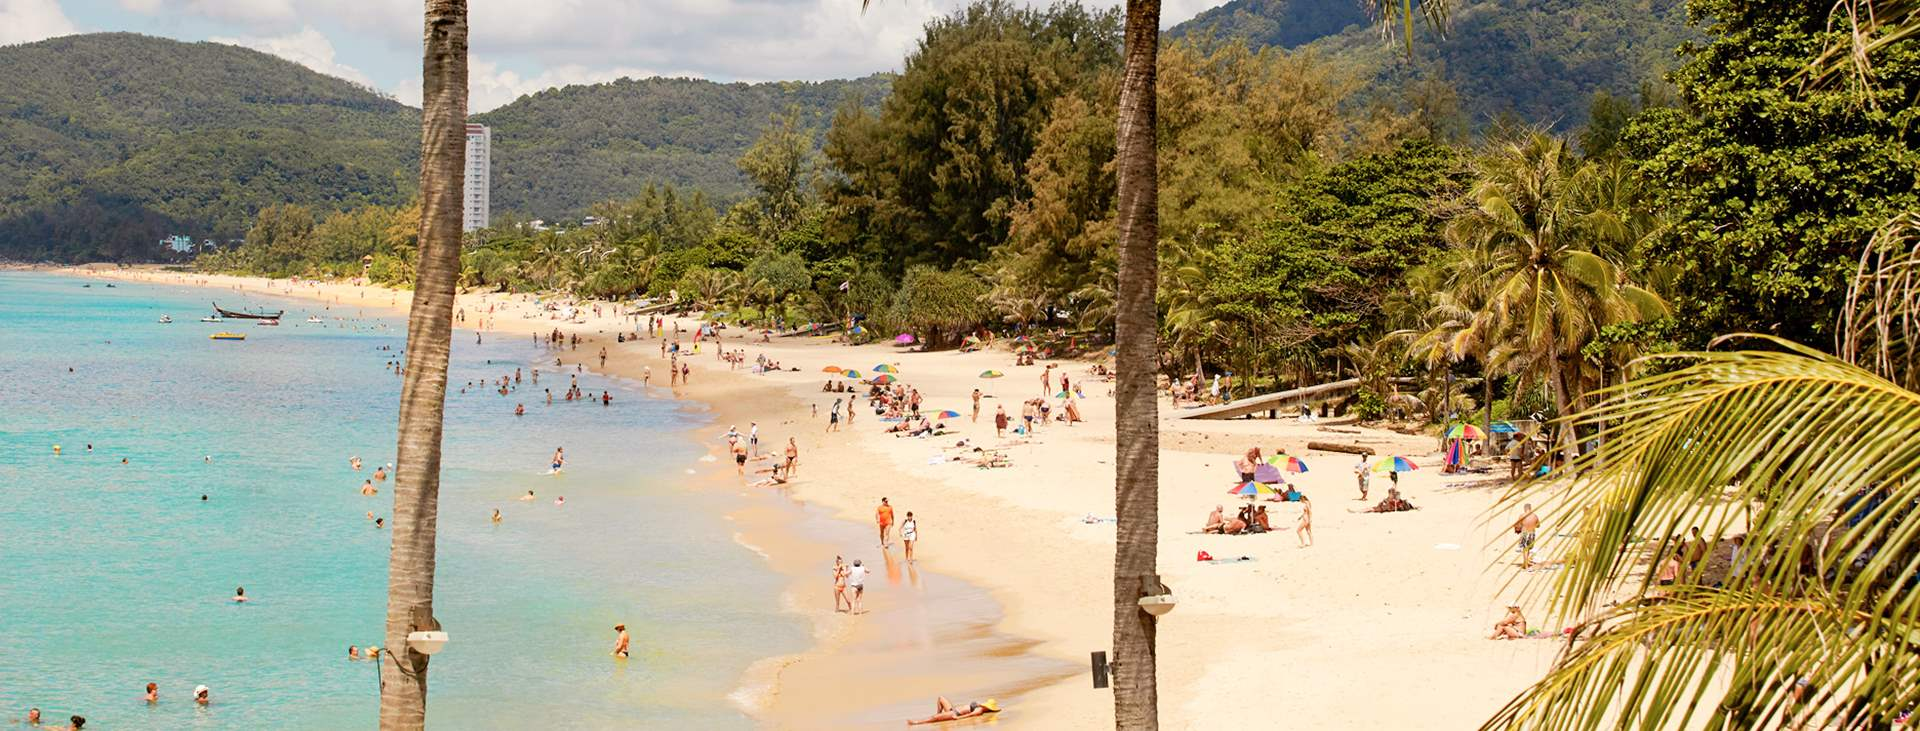 Resor till Karon Beach i Thailand